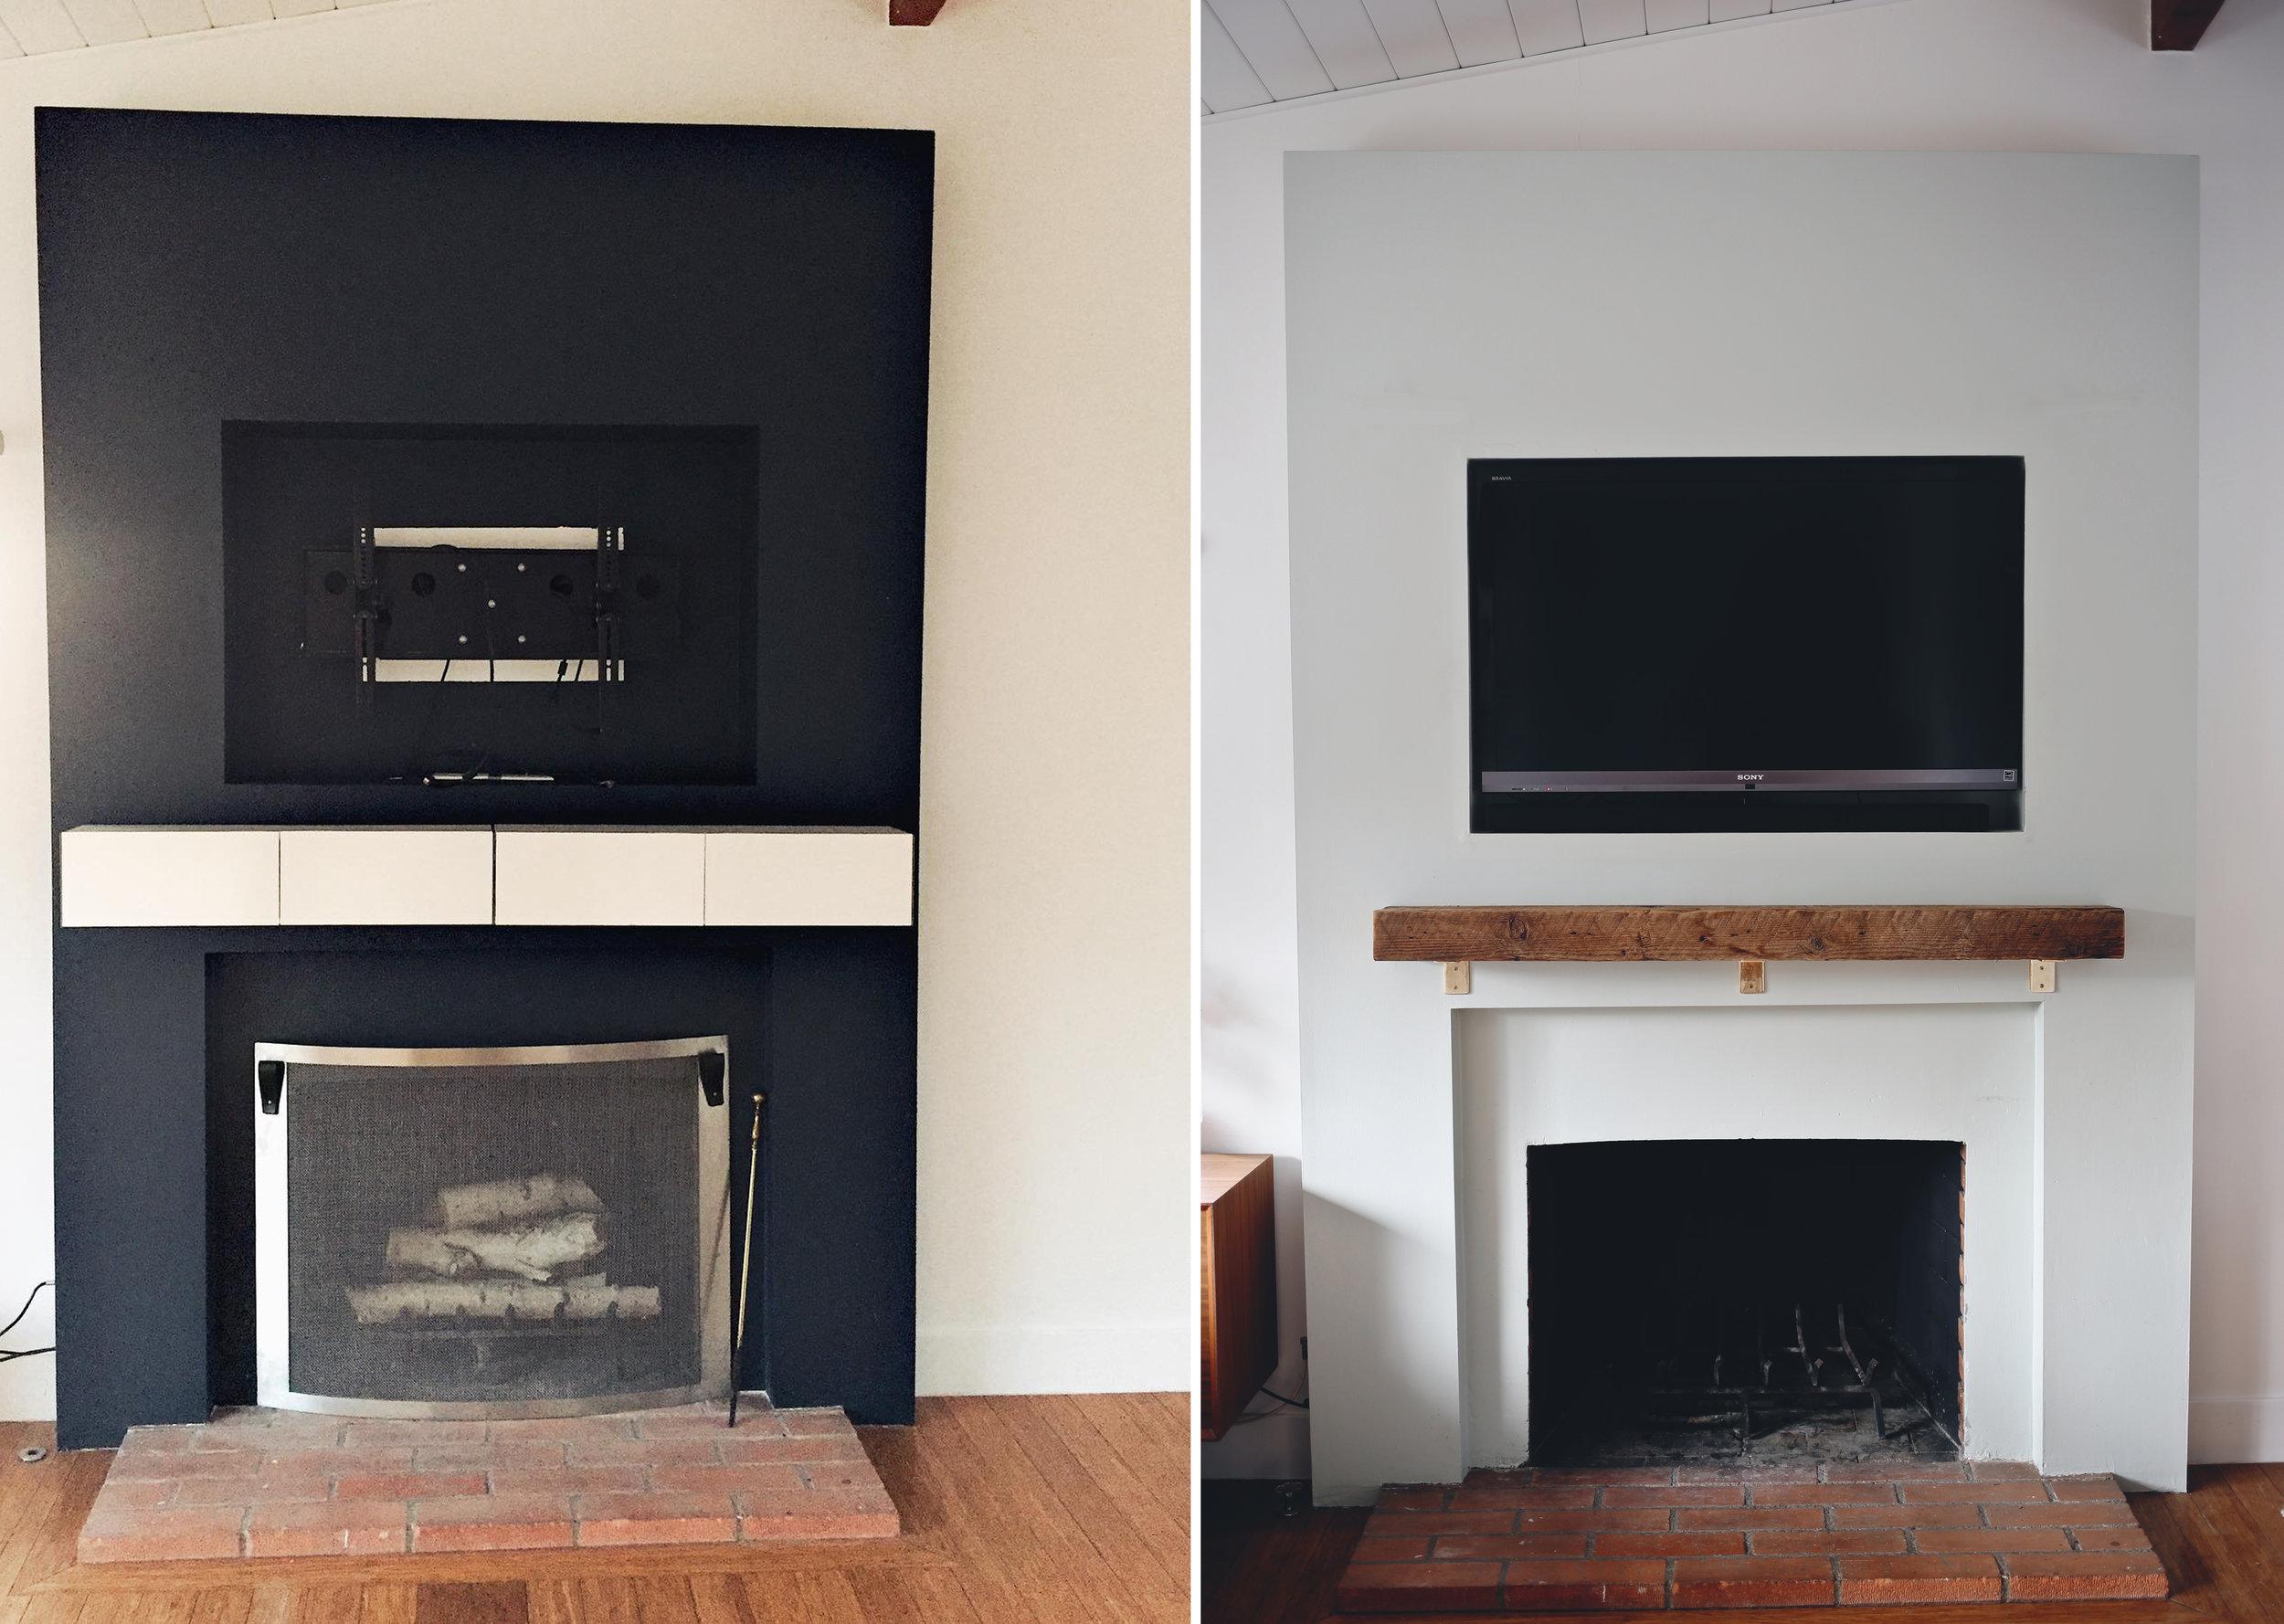 06_Fireplace DIY Before | Kristin Guy Dine X Design.jpg